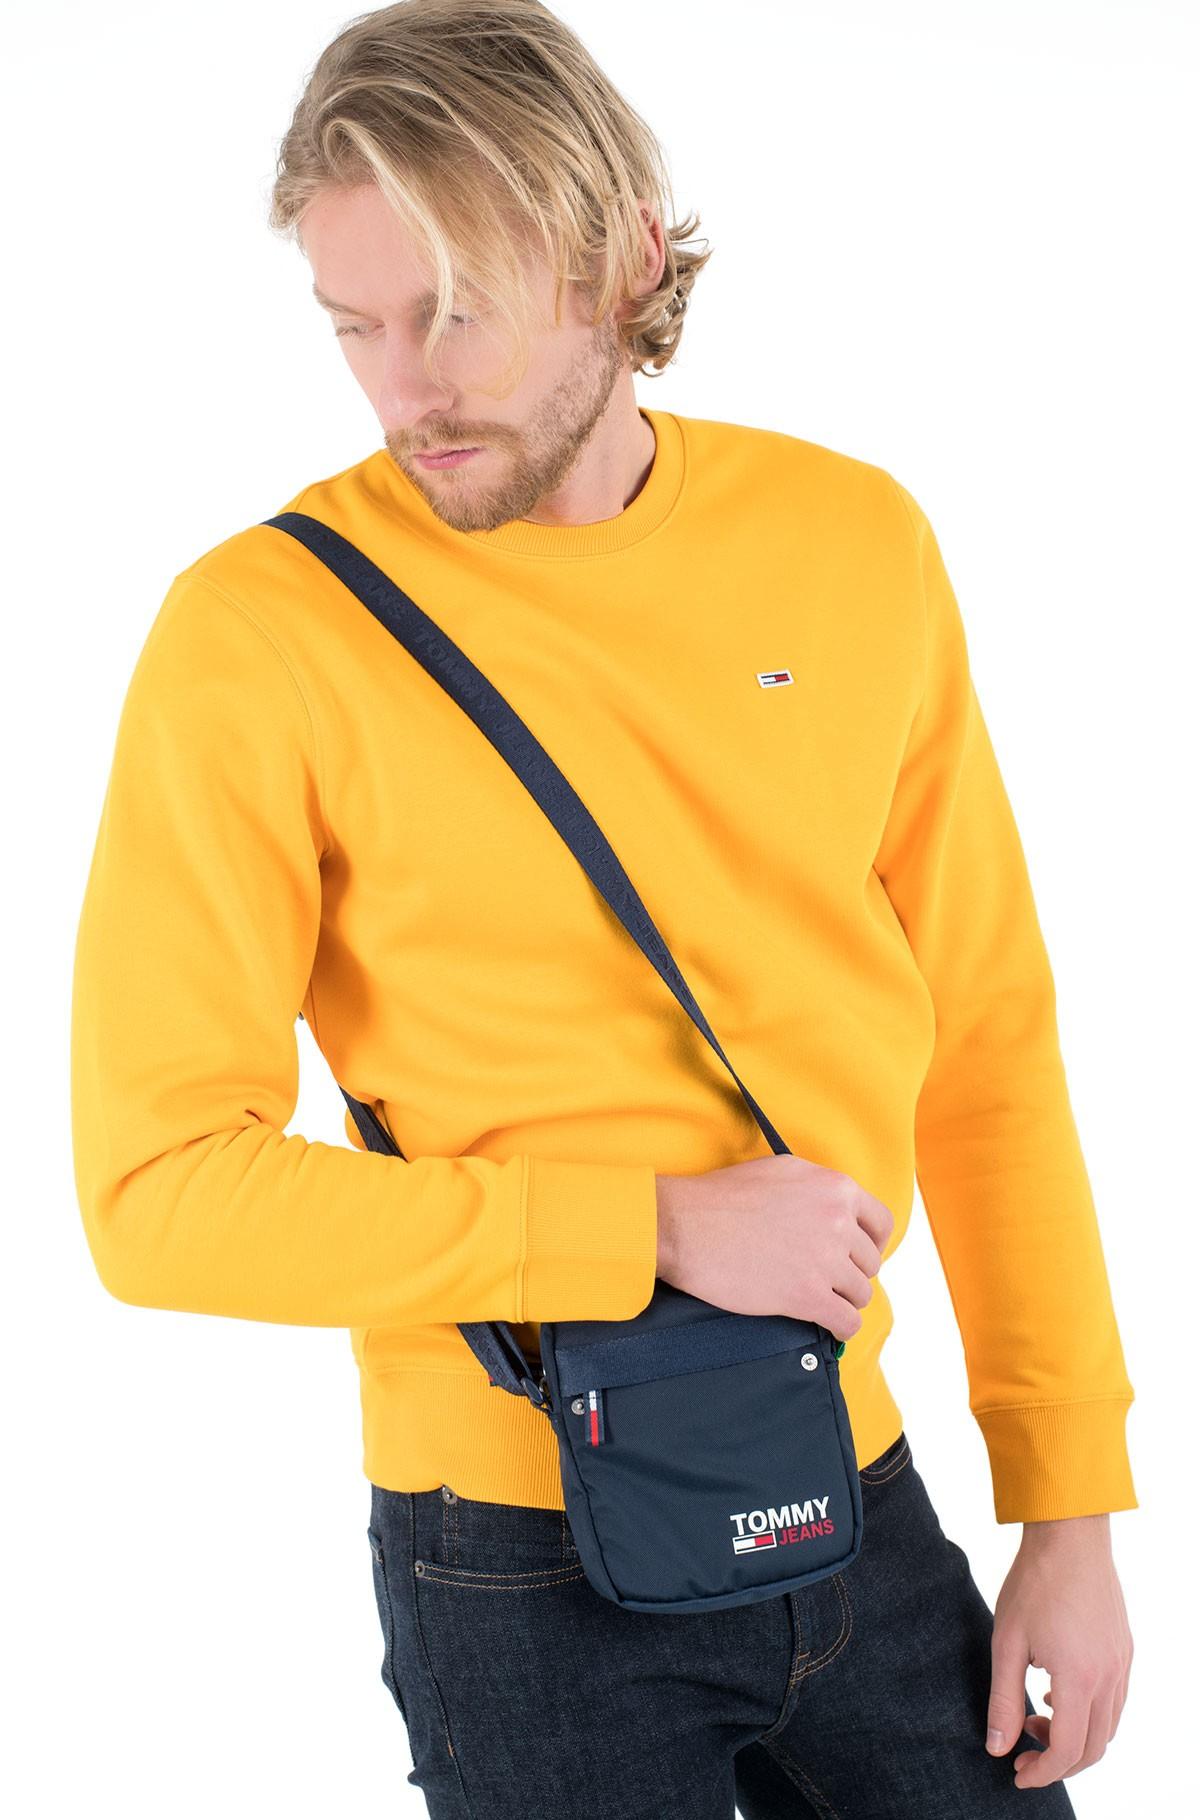 Shoulder bag TJM CAMPUS REPORTER-full-1